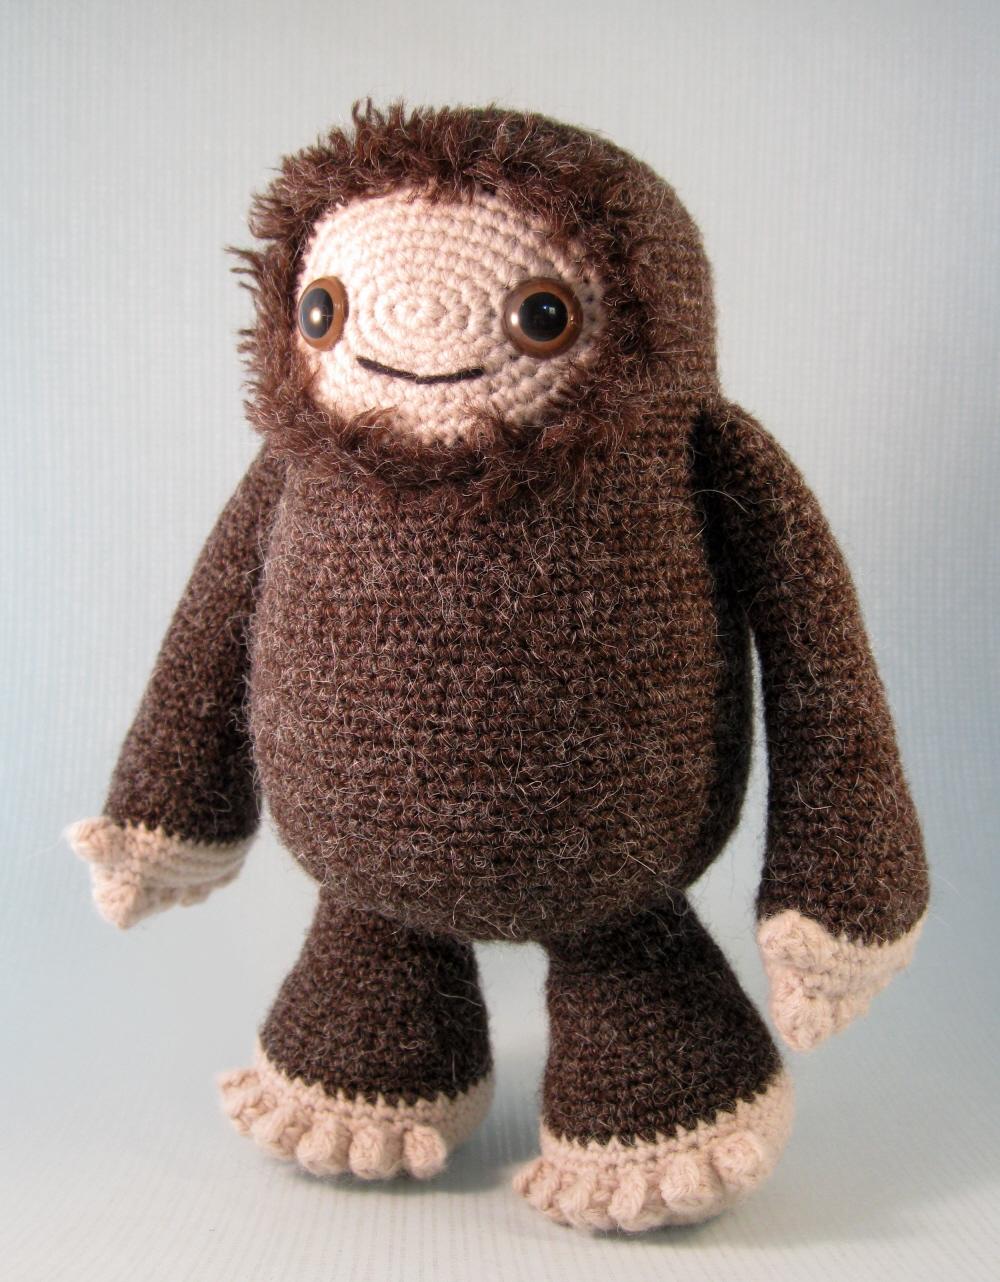 Crochet Patterns-Knitting and Crochet Communication (Cant post new ... | 1282x1000